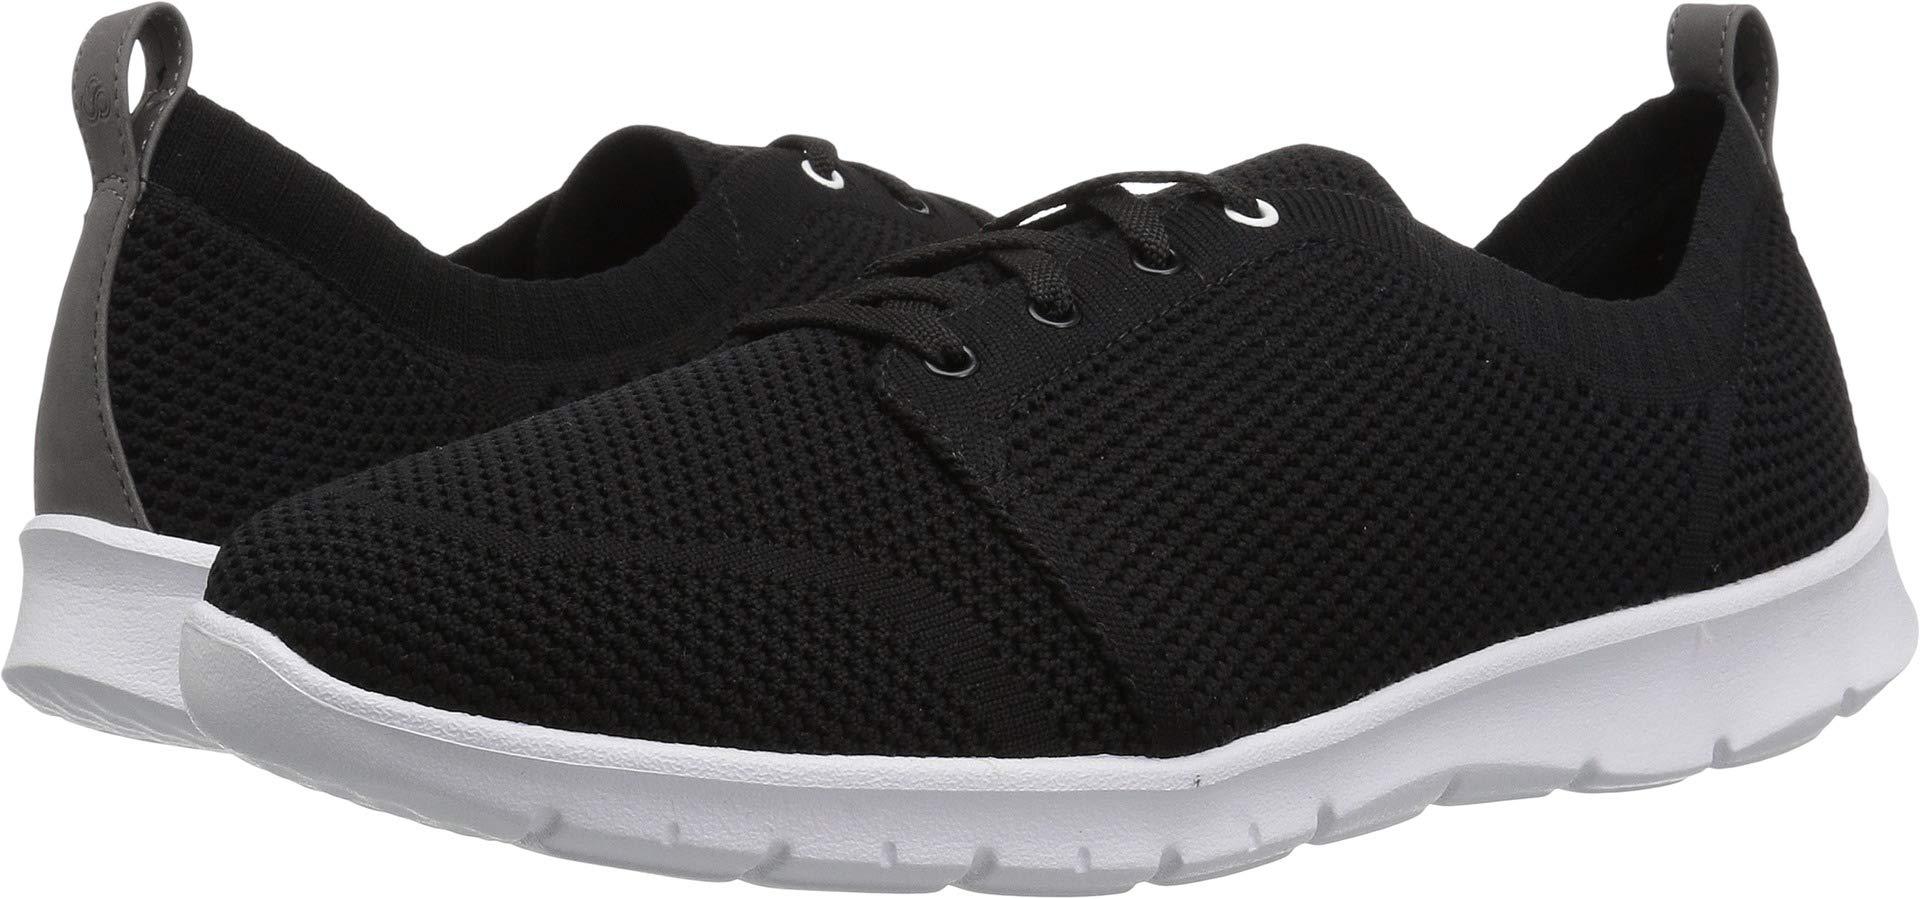 CLARKS Women's Step Allenasun Sneaker, Black Textile, 080 M US